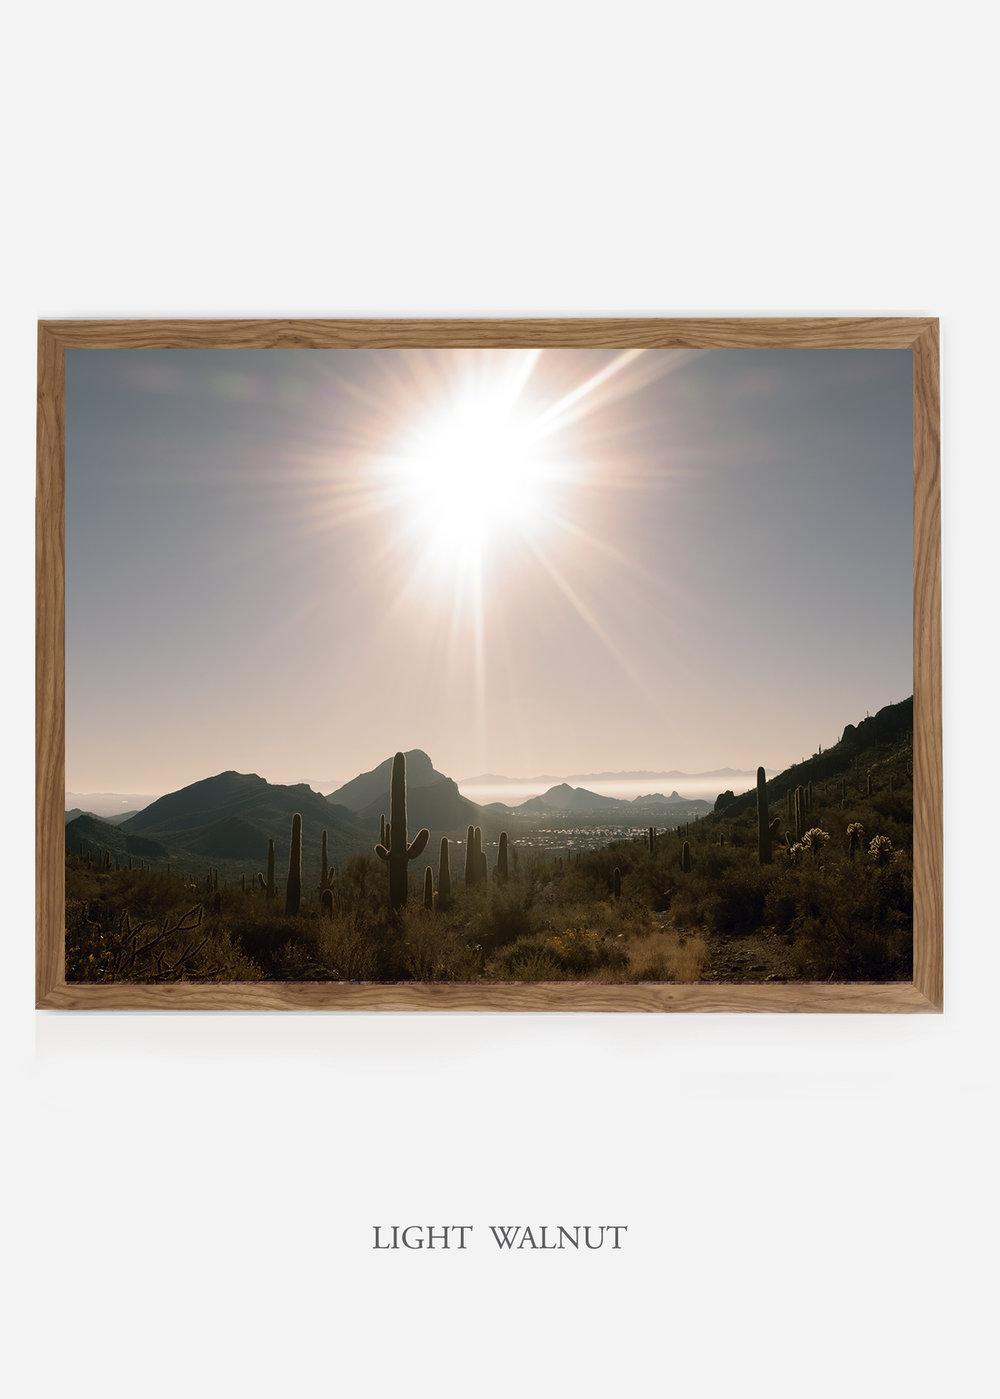 nomat_lightwalnutframe-saguaroNo.15-wildercalifornia-art-wallart-cactusprint-homedecor-prints-arizona-botanical-artwork-interiordesign.jpg